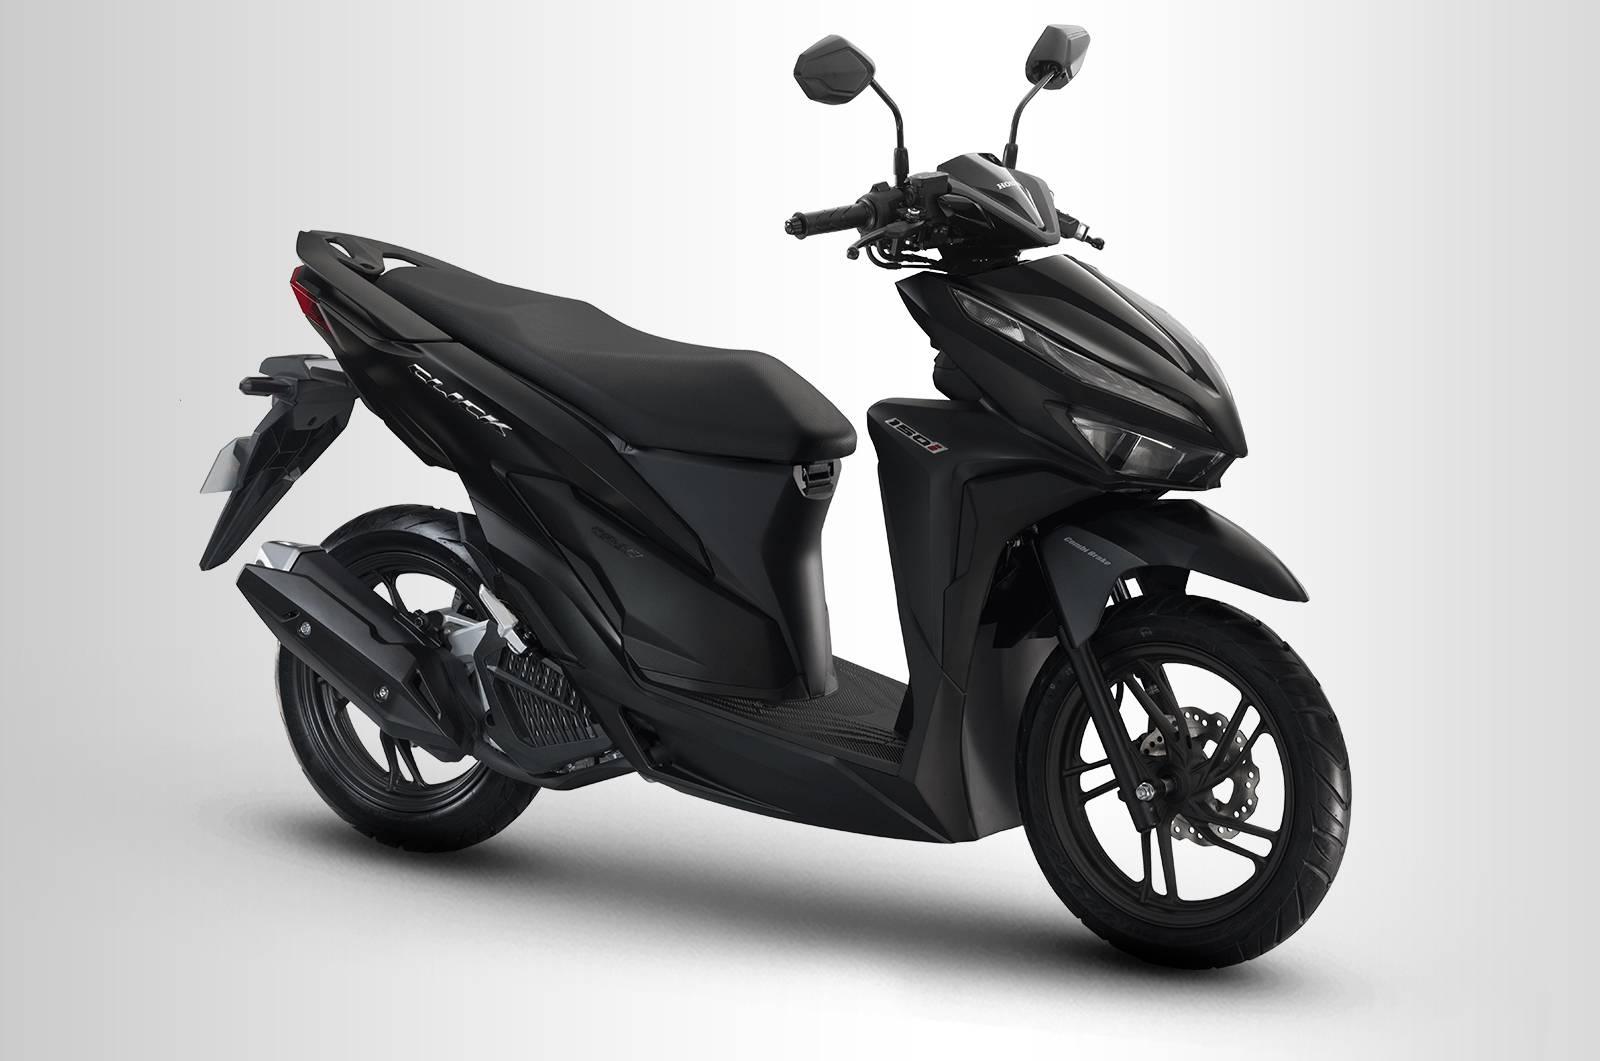 Motortrade | Philippine's Best Motorcycle Dealer | HONDA Click 150i - New